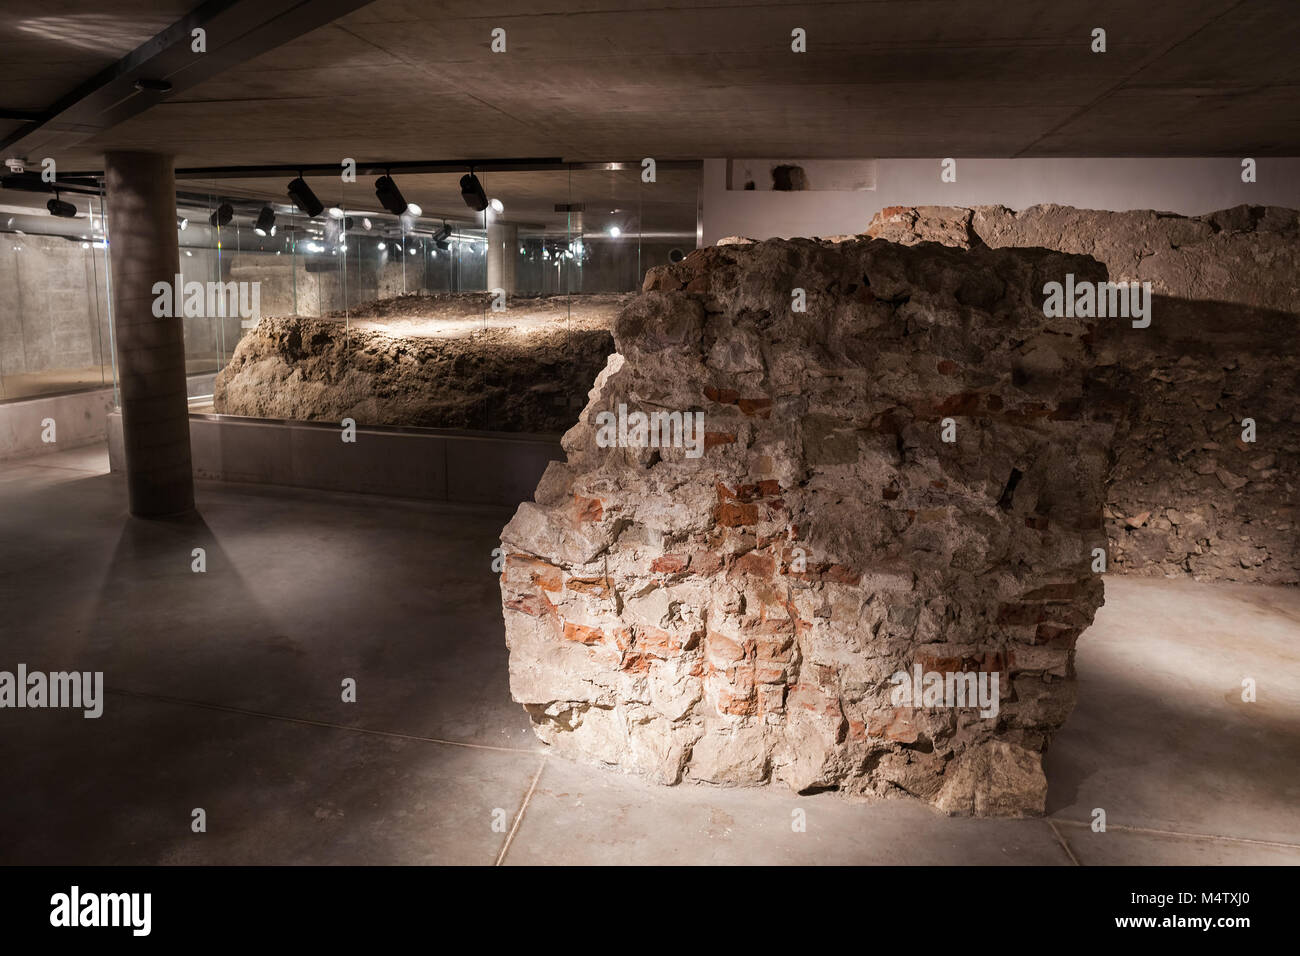 Underground ruins exhibition in Bratislava Castle Museum of History in Bratislava, Slovakia, Europe Stock Photo